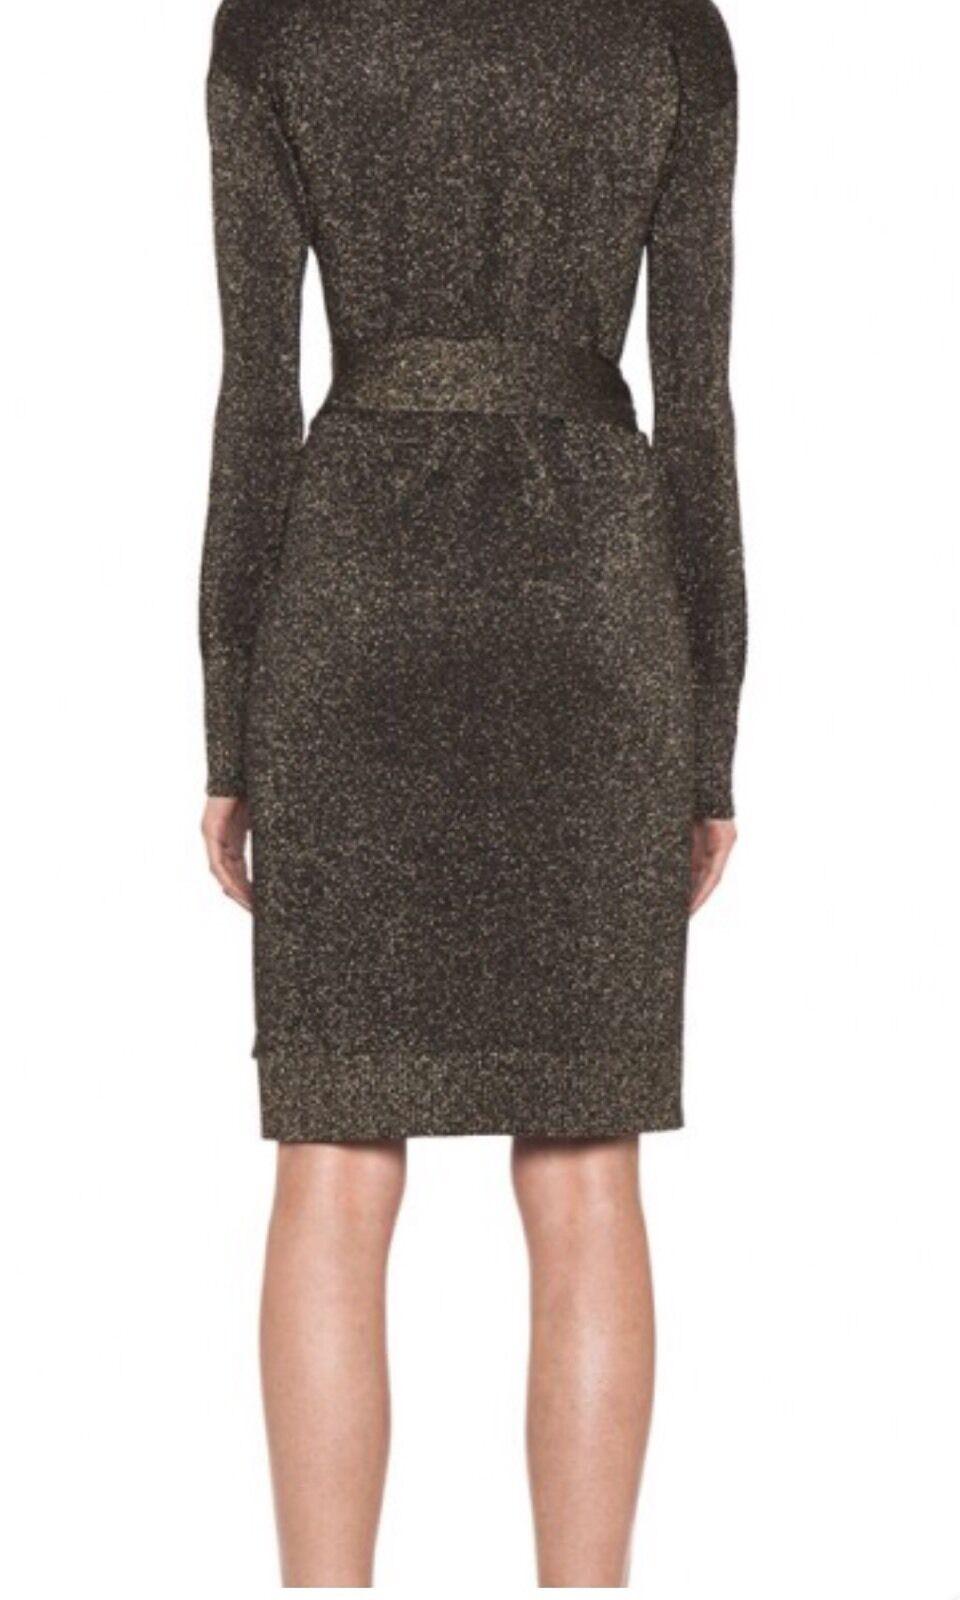 Diane Von FURSTENBERG Fosette Fosette Fosette Metallic Wrap Dress, Size M , 465 RP e6dedd